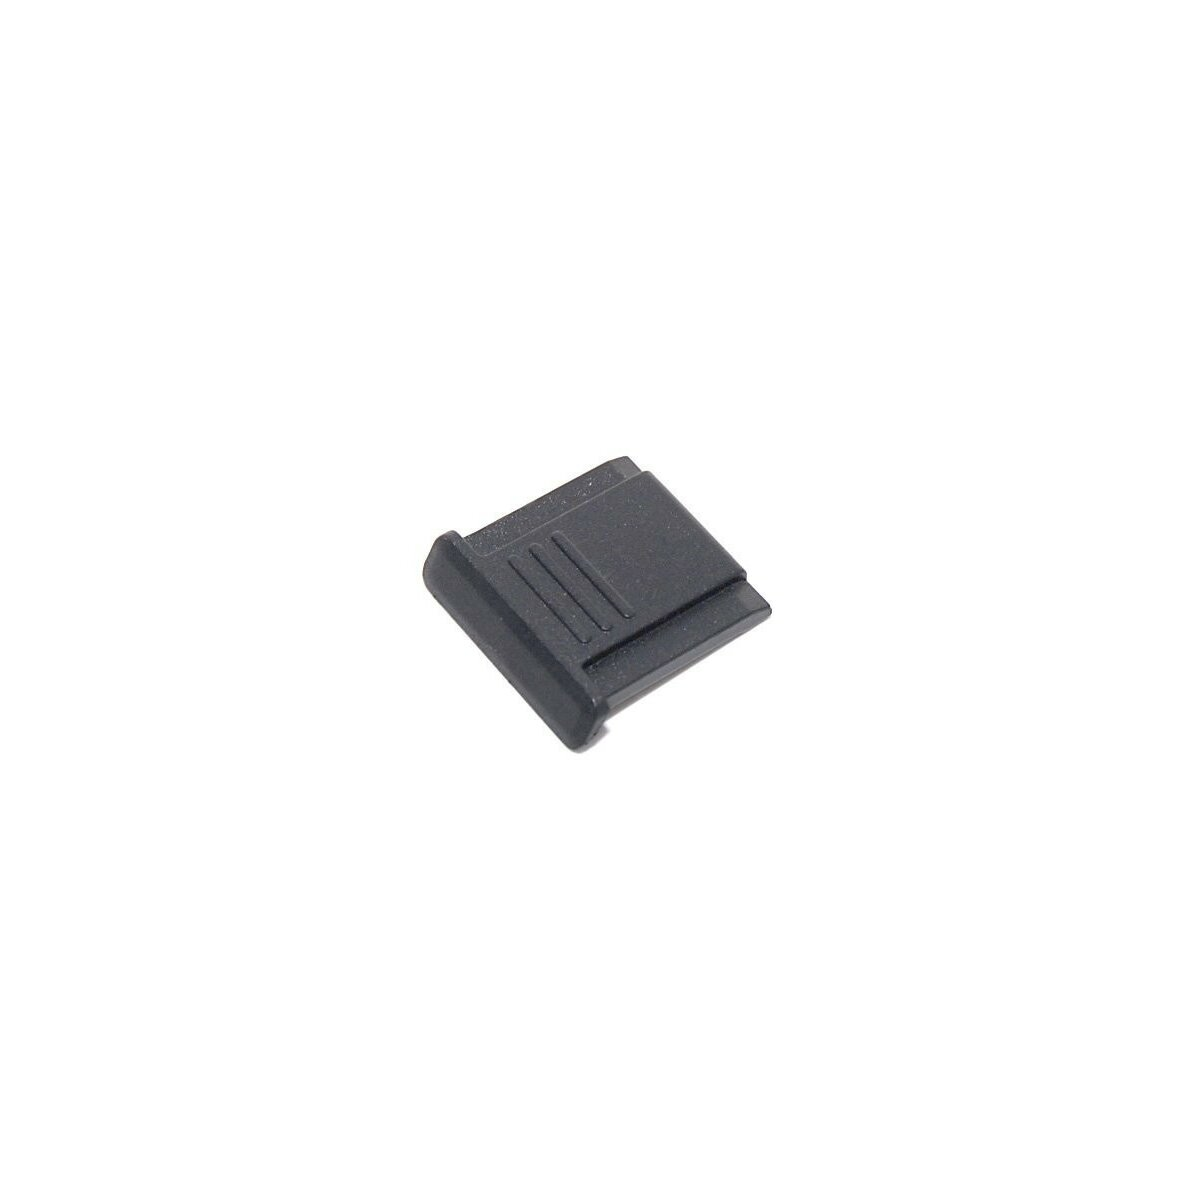 Schutzklappe Blitzschuhschutz kompatibel mit Canon EOS 1000D 500D 450D 400D 30D / PowerShot G9 G10 G11 SX20IS SX10IS (BS3A)(HC4A)